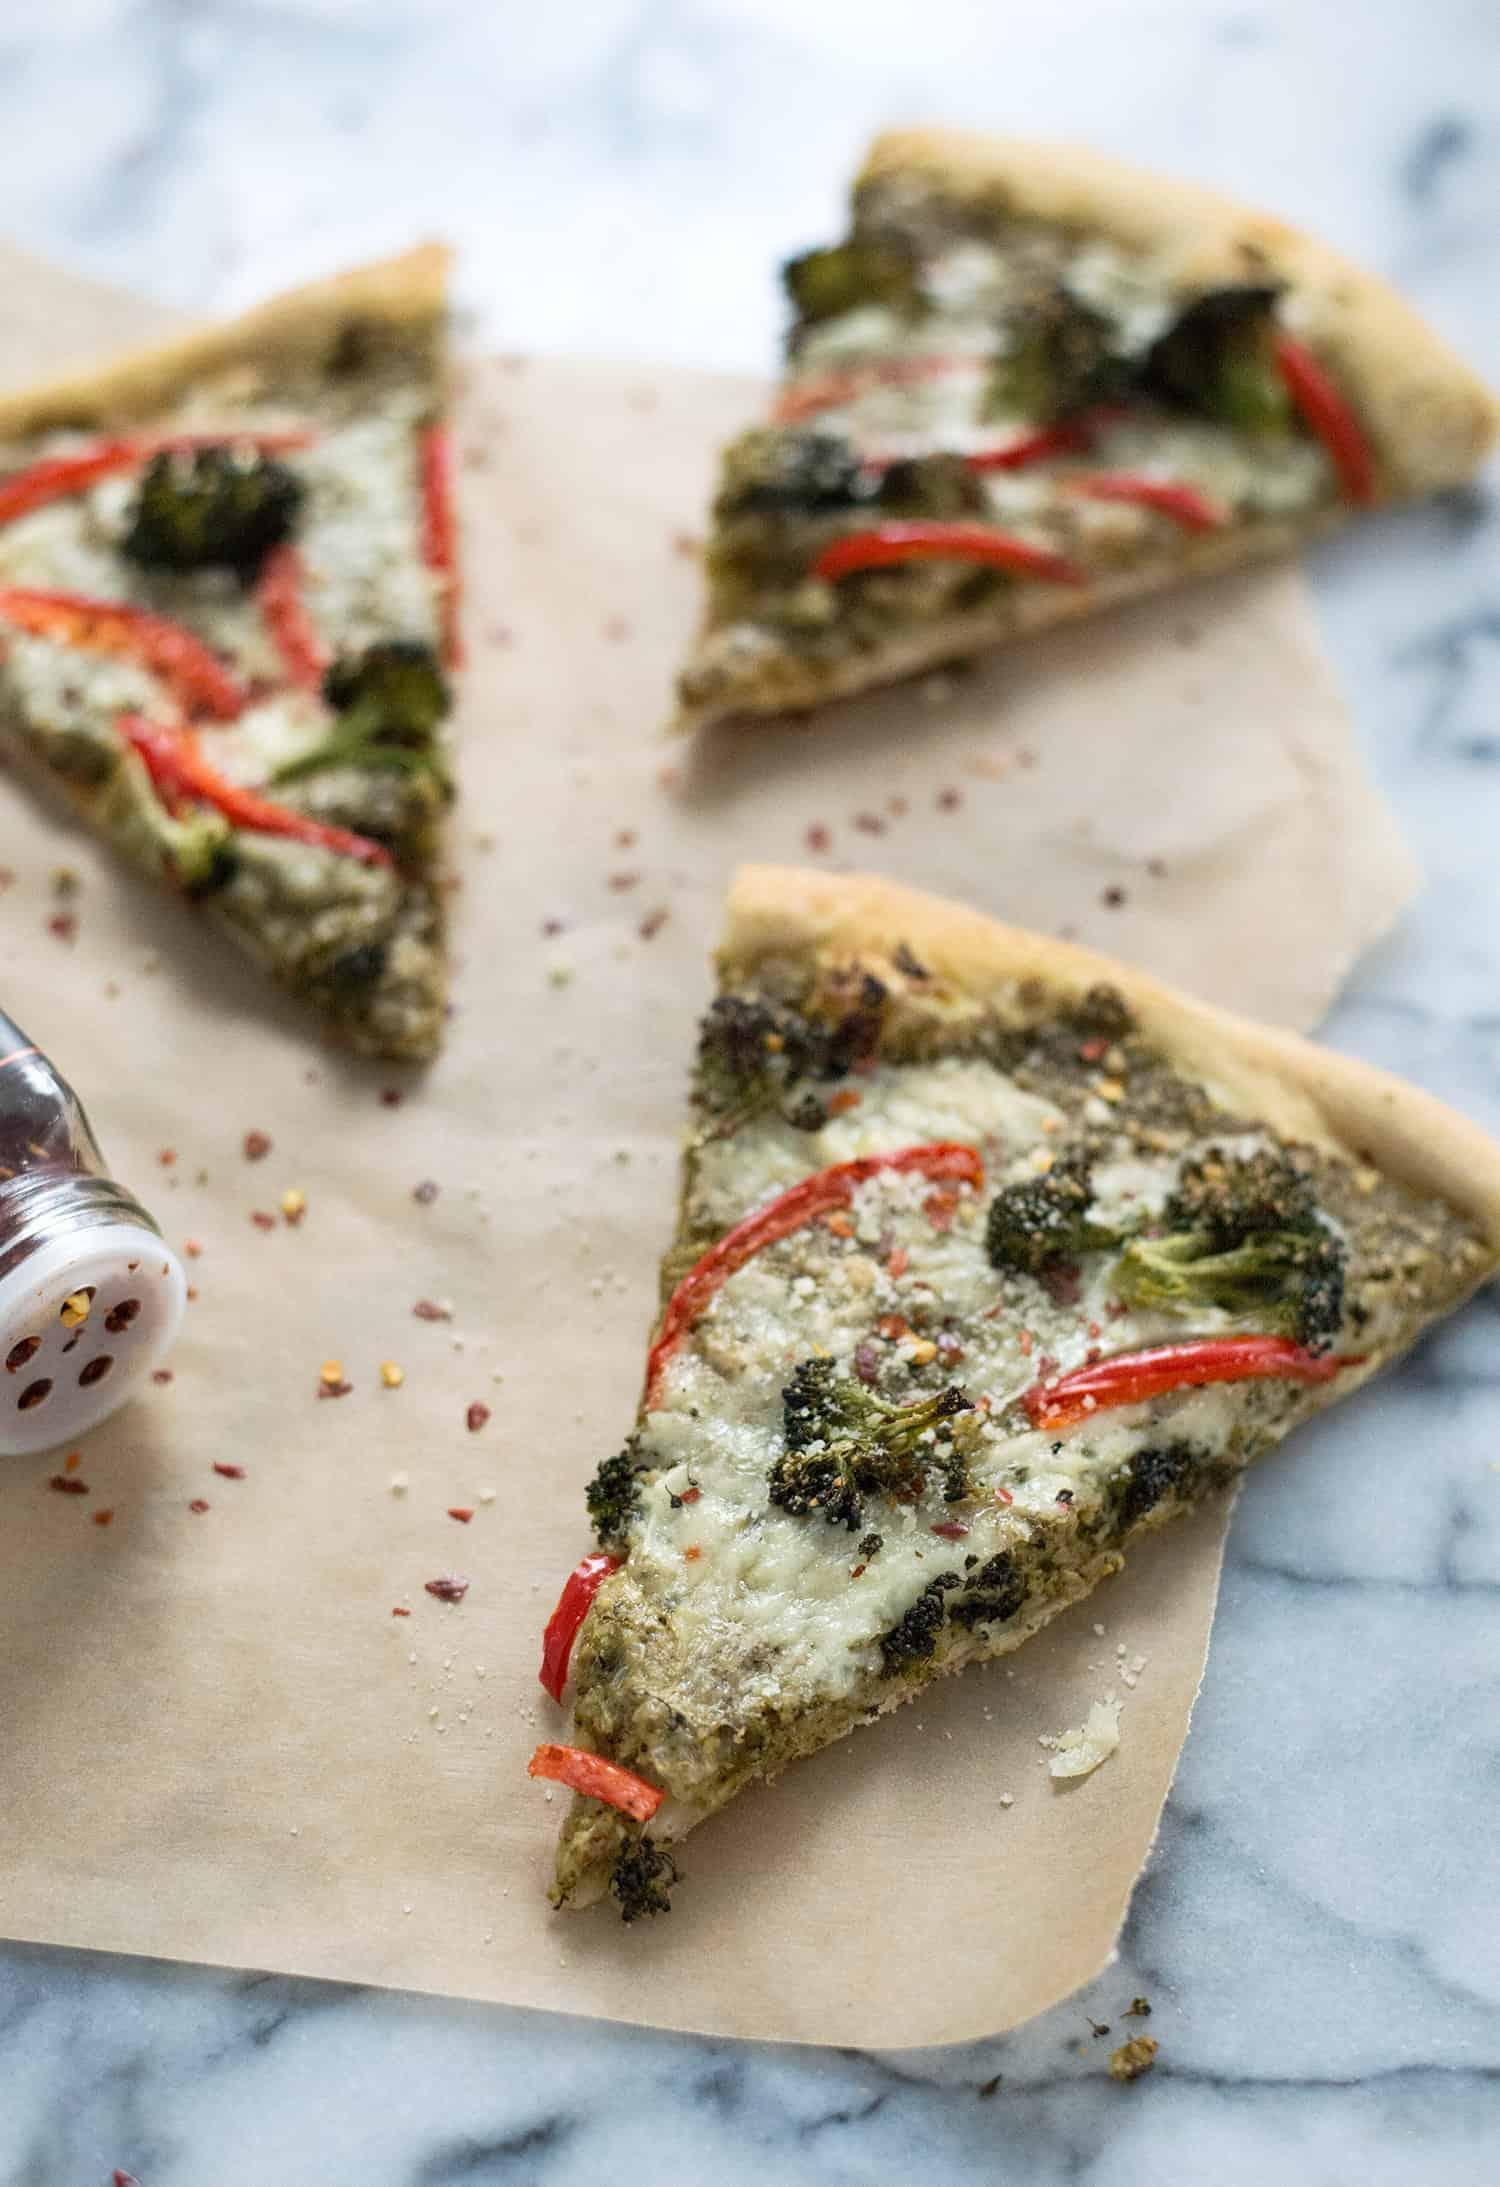 Roasted Broccoli Pesto Pizza! Roasted broccoli pesto, roasted broccoli, peppers, and fontina cheese. So, so yummy! Vegetarian | www.delishknowledge.com